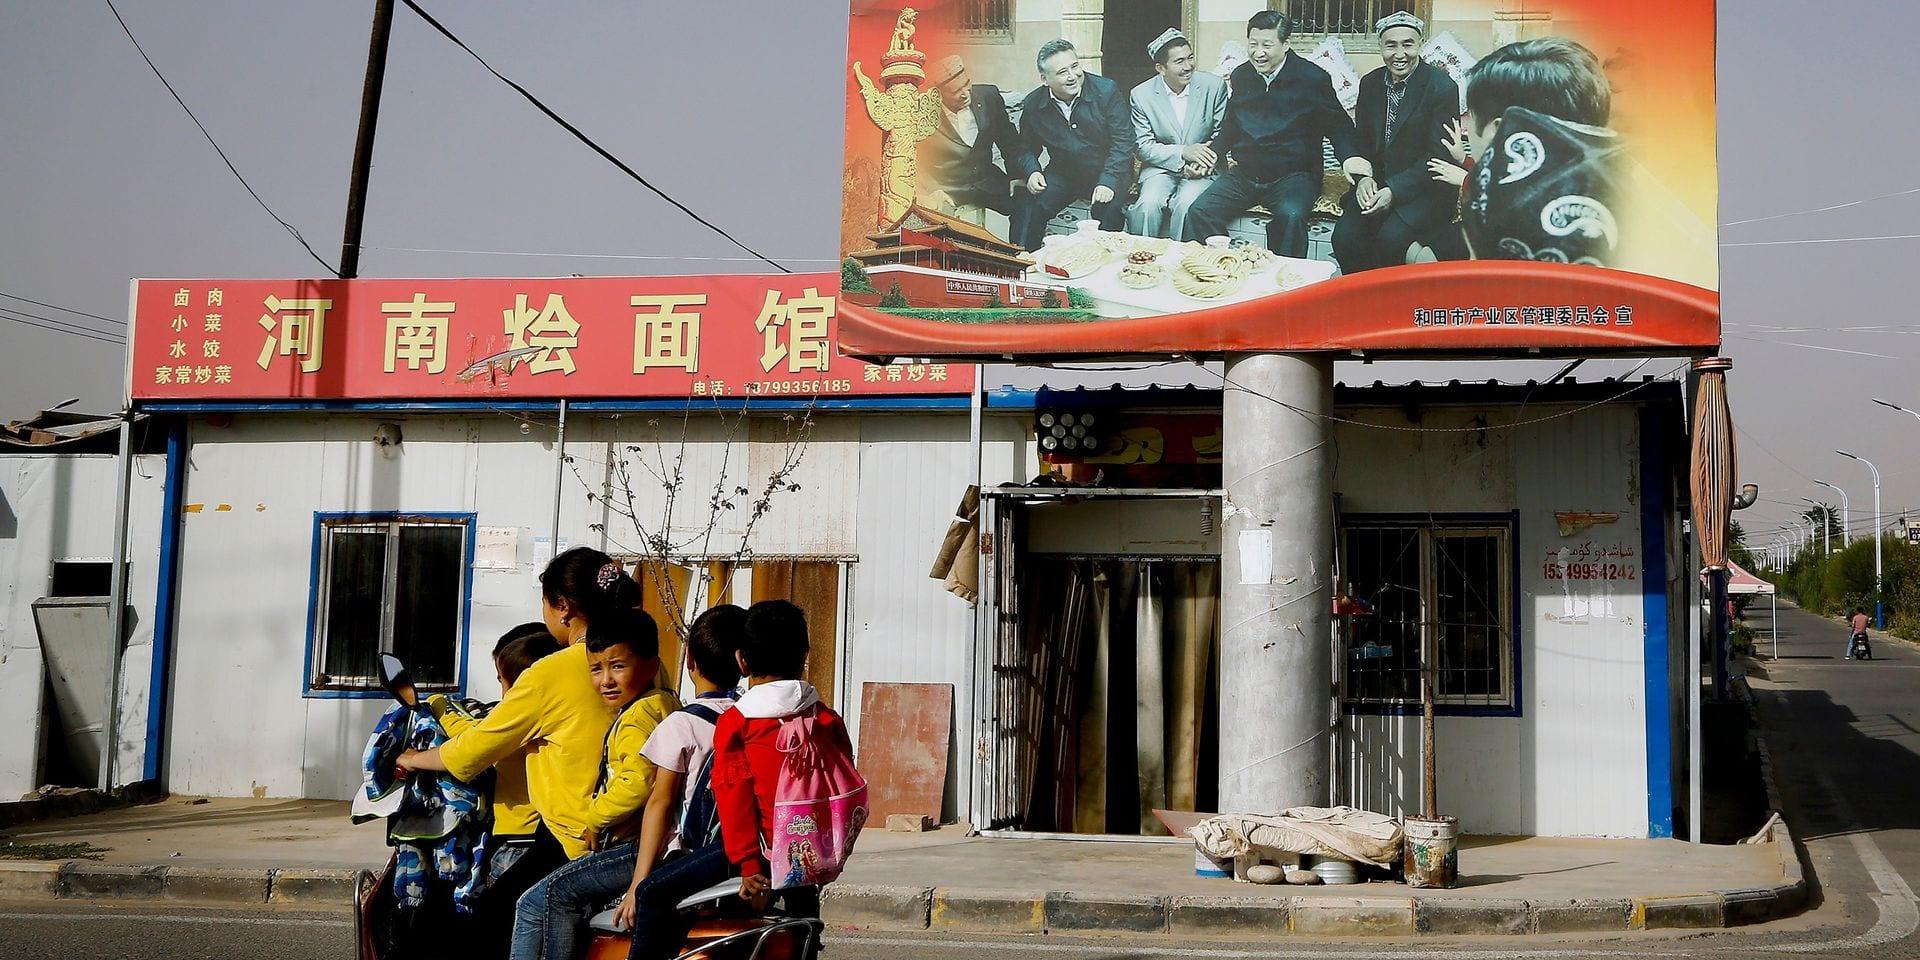 Edito : la Chine de Xi dans une impasse